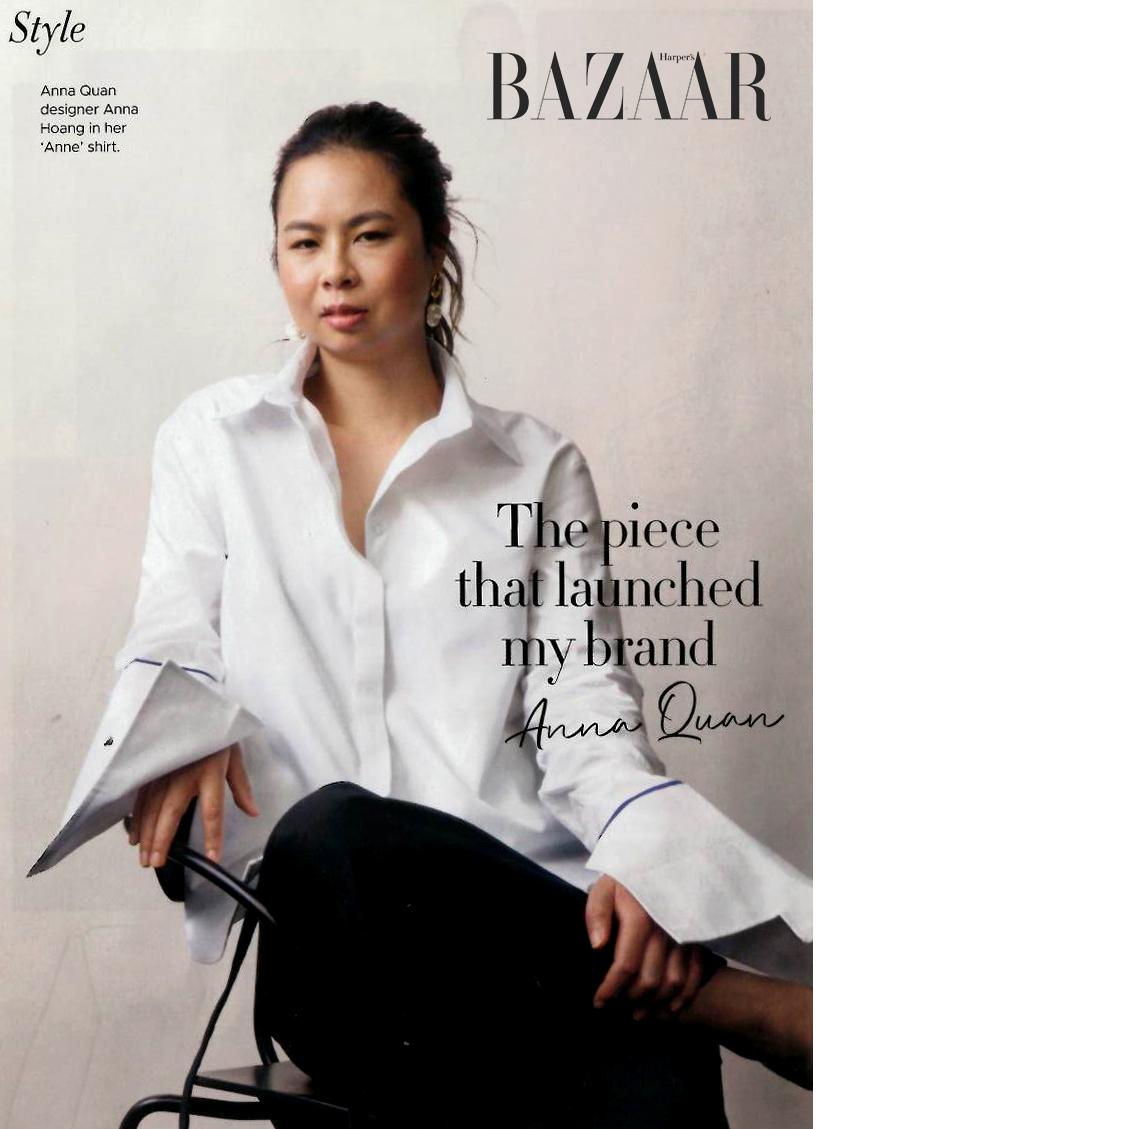 Anna QUAN - Designer Anna Hoang's label has been featured locally and internationally in Vogue, Harpers Bazaar and Elle magazine.www.annaquan.comwww.harpersbazaar.com.au